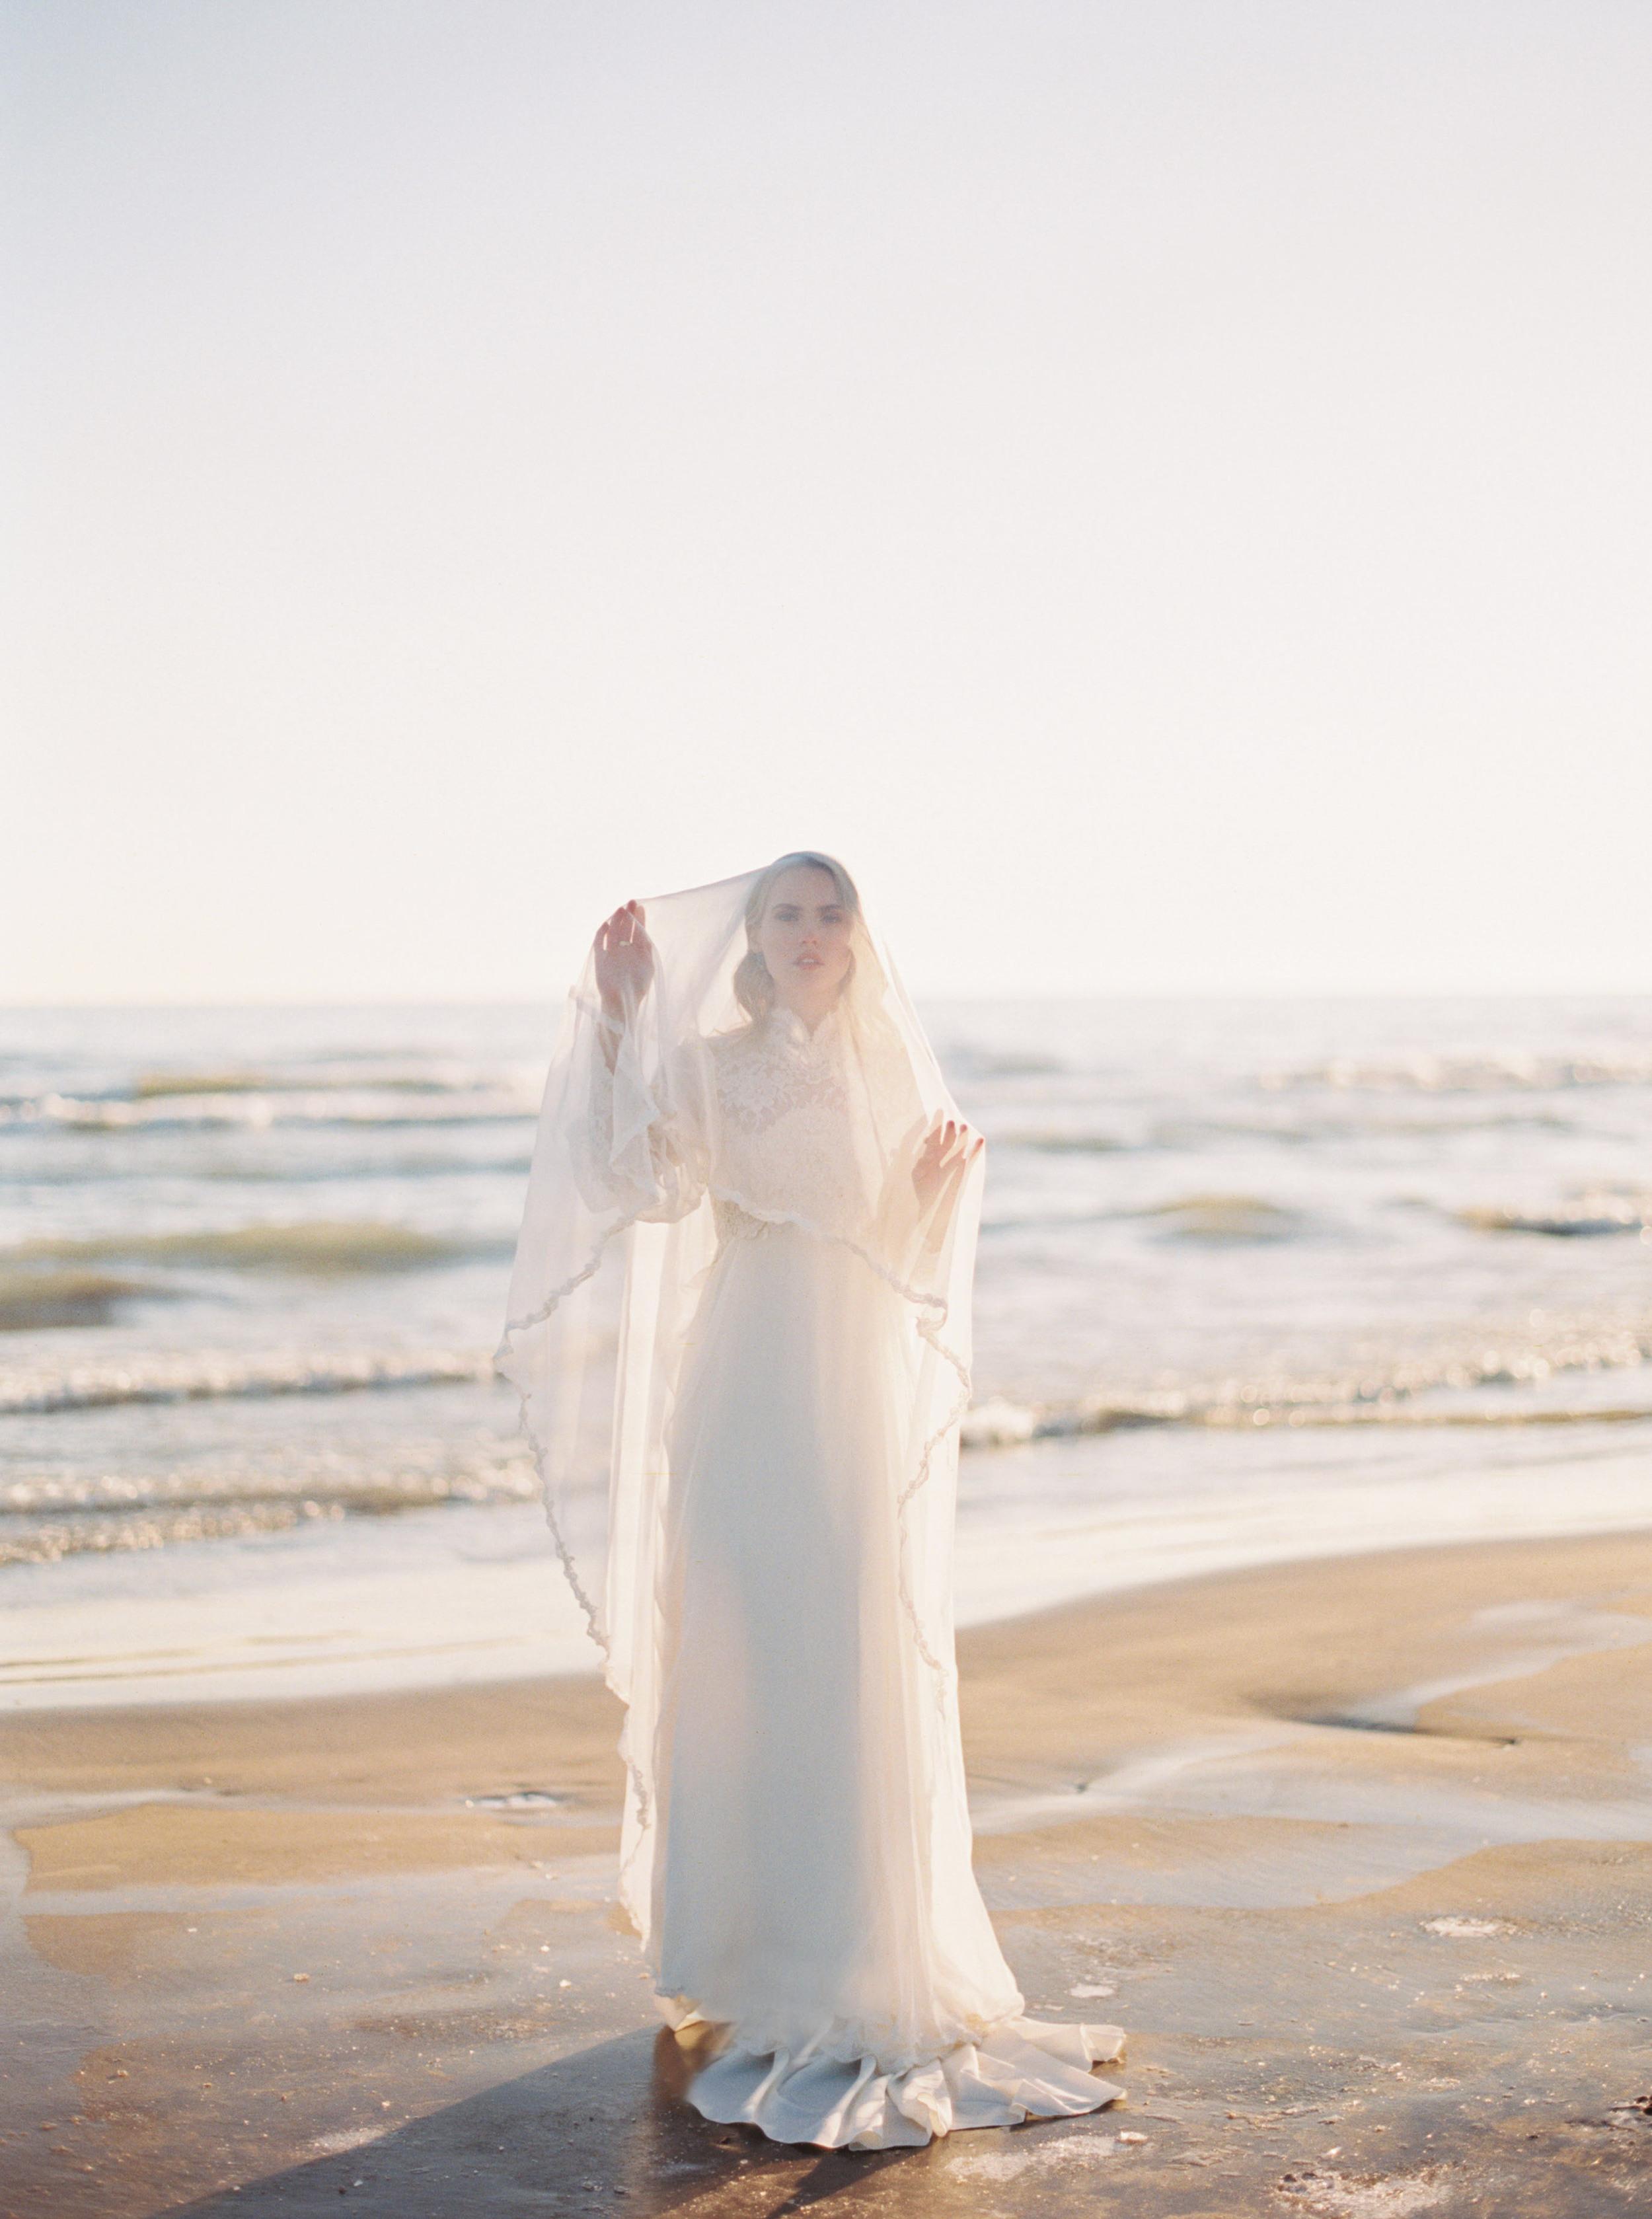 Kyle John l Fine Art Wedding Photography l Chicago, Copenhagen, California, New York, Destination l Blog l Sea and Sand_19